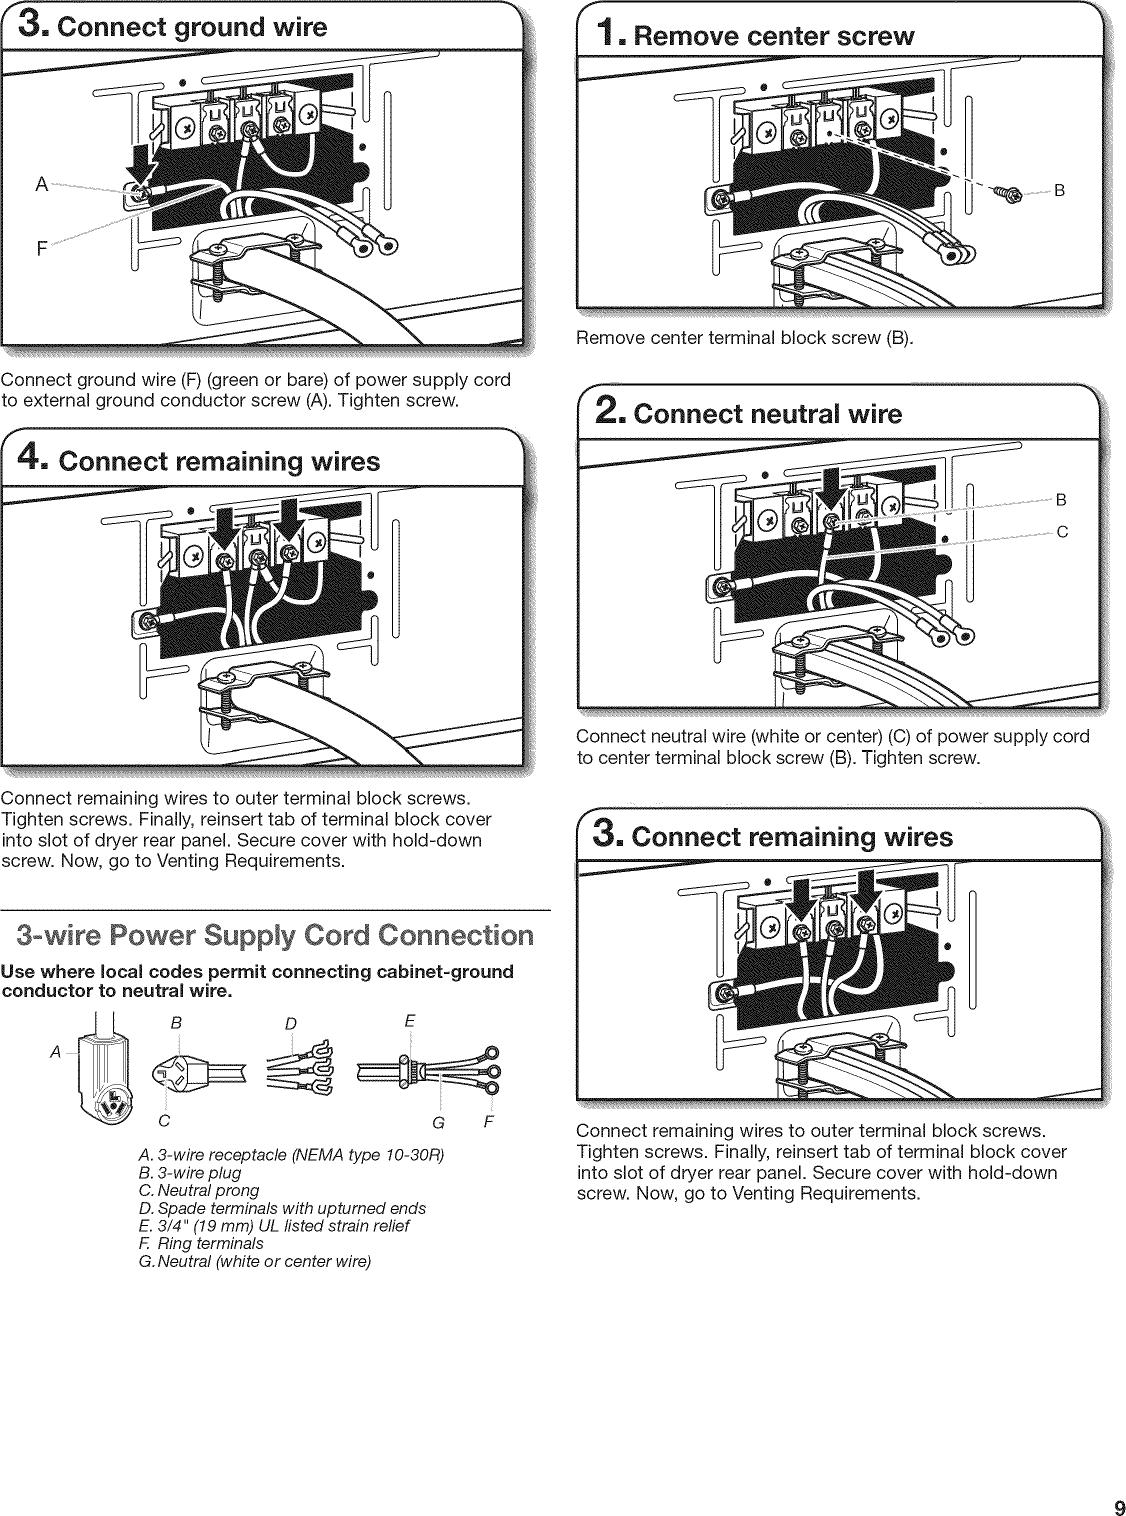 Funky Neutral Wires Mold - Wiring Diagram Ideas - blogitia.com